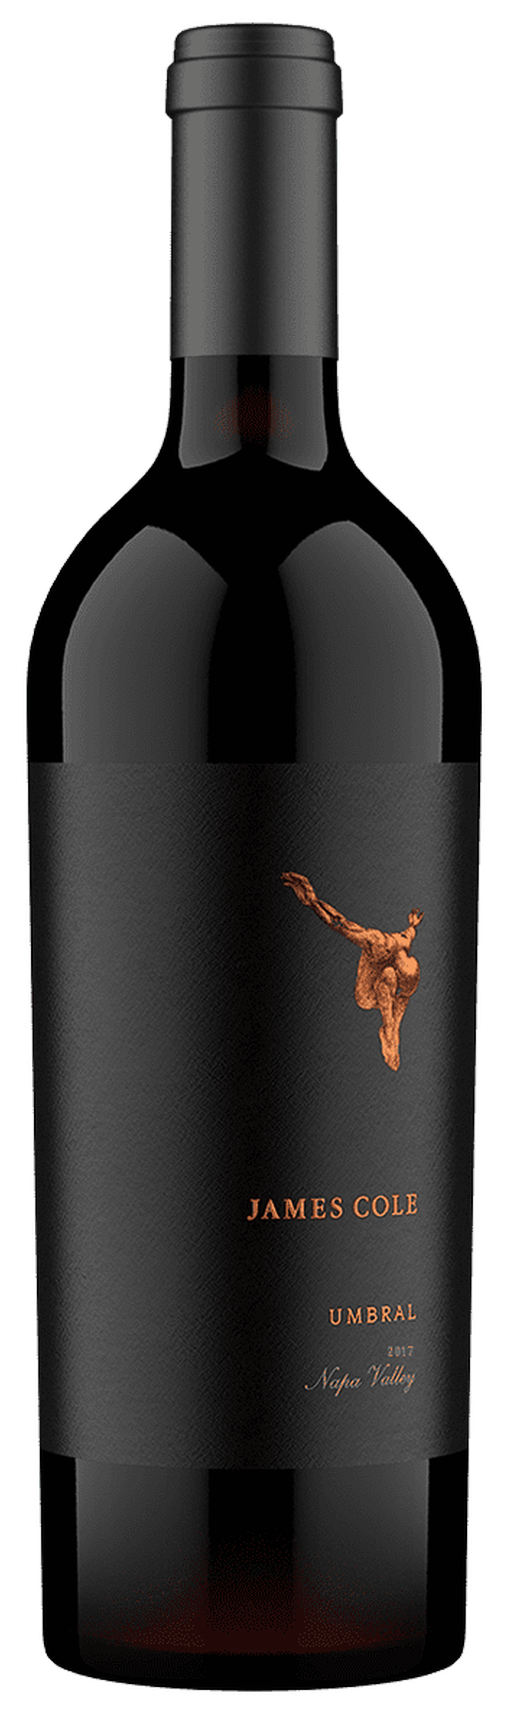 2017 Umbral Reserve Cabernet Sauvignon